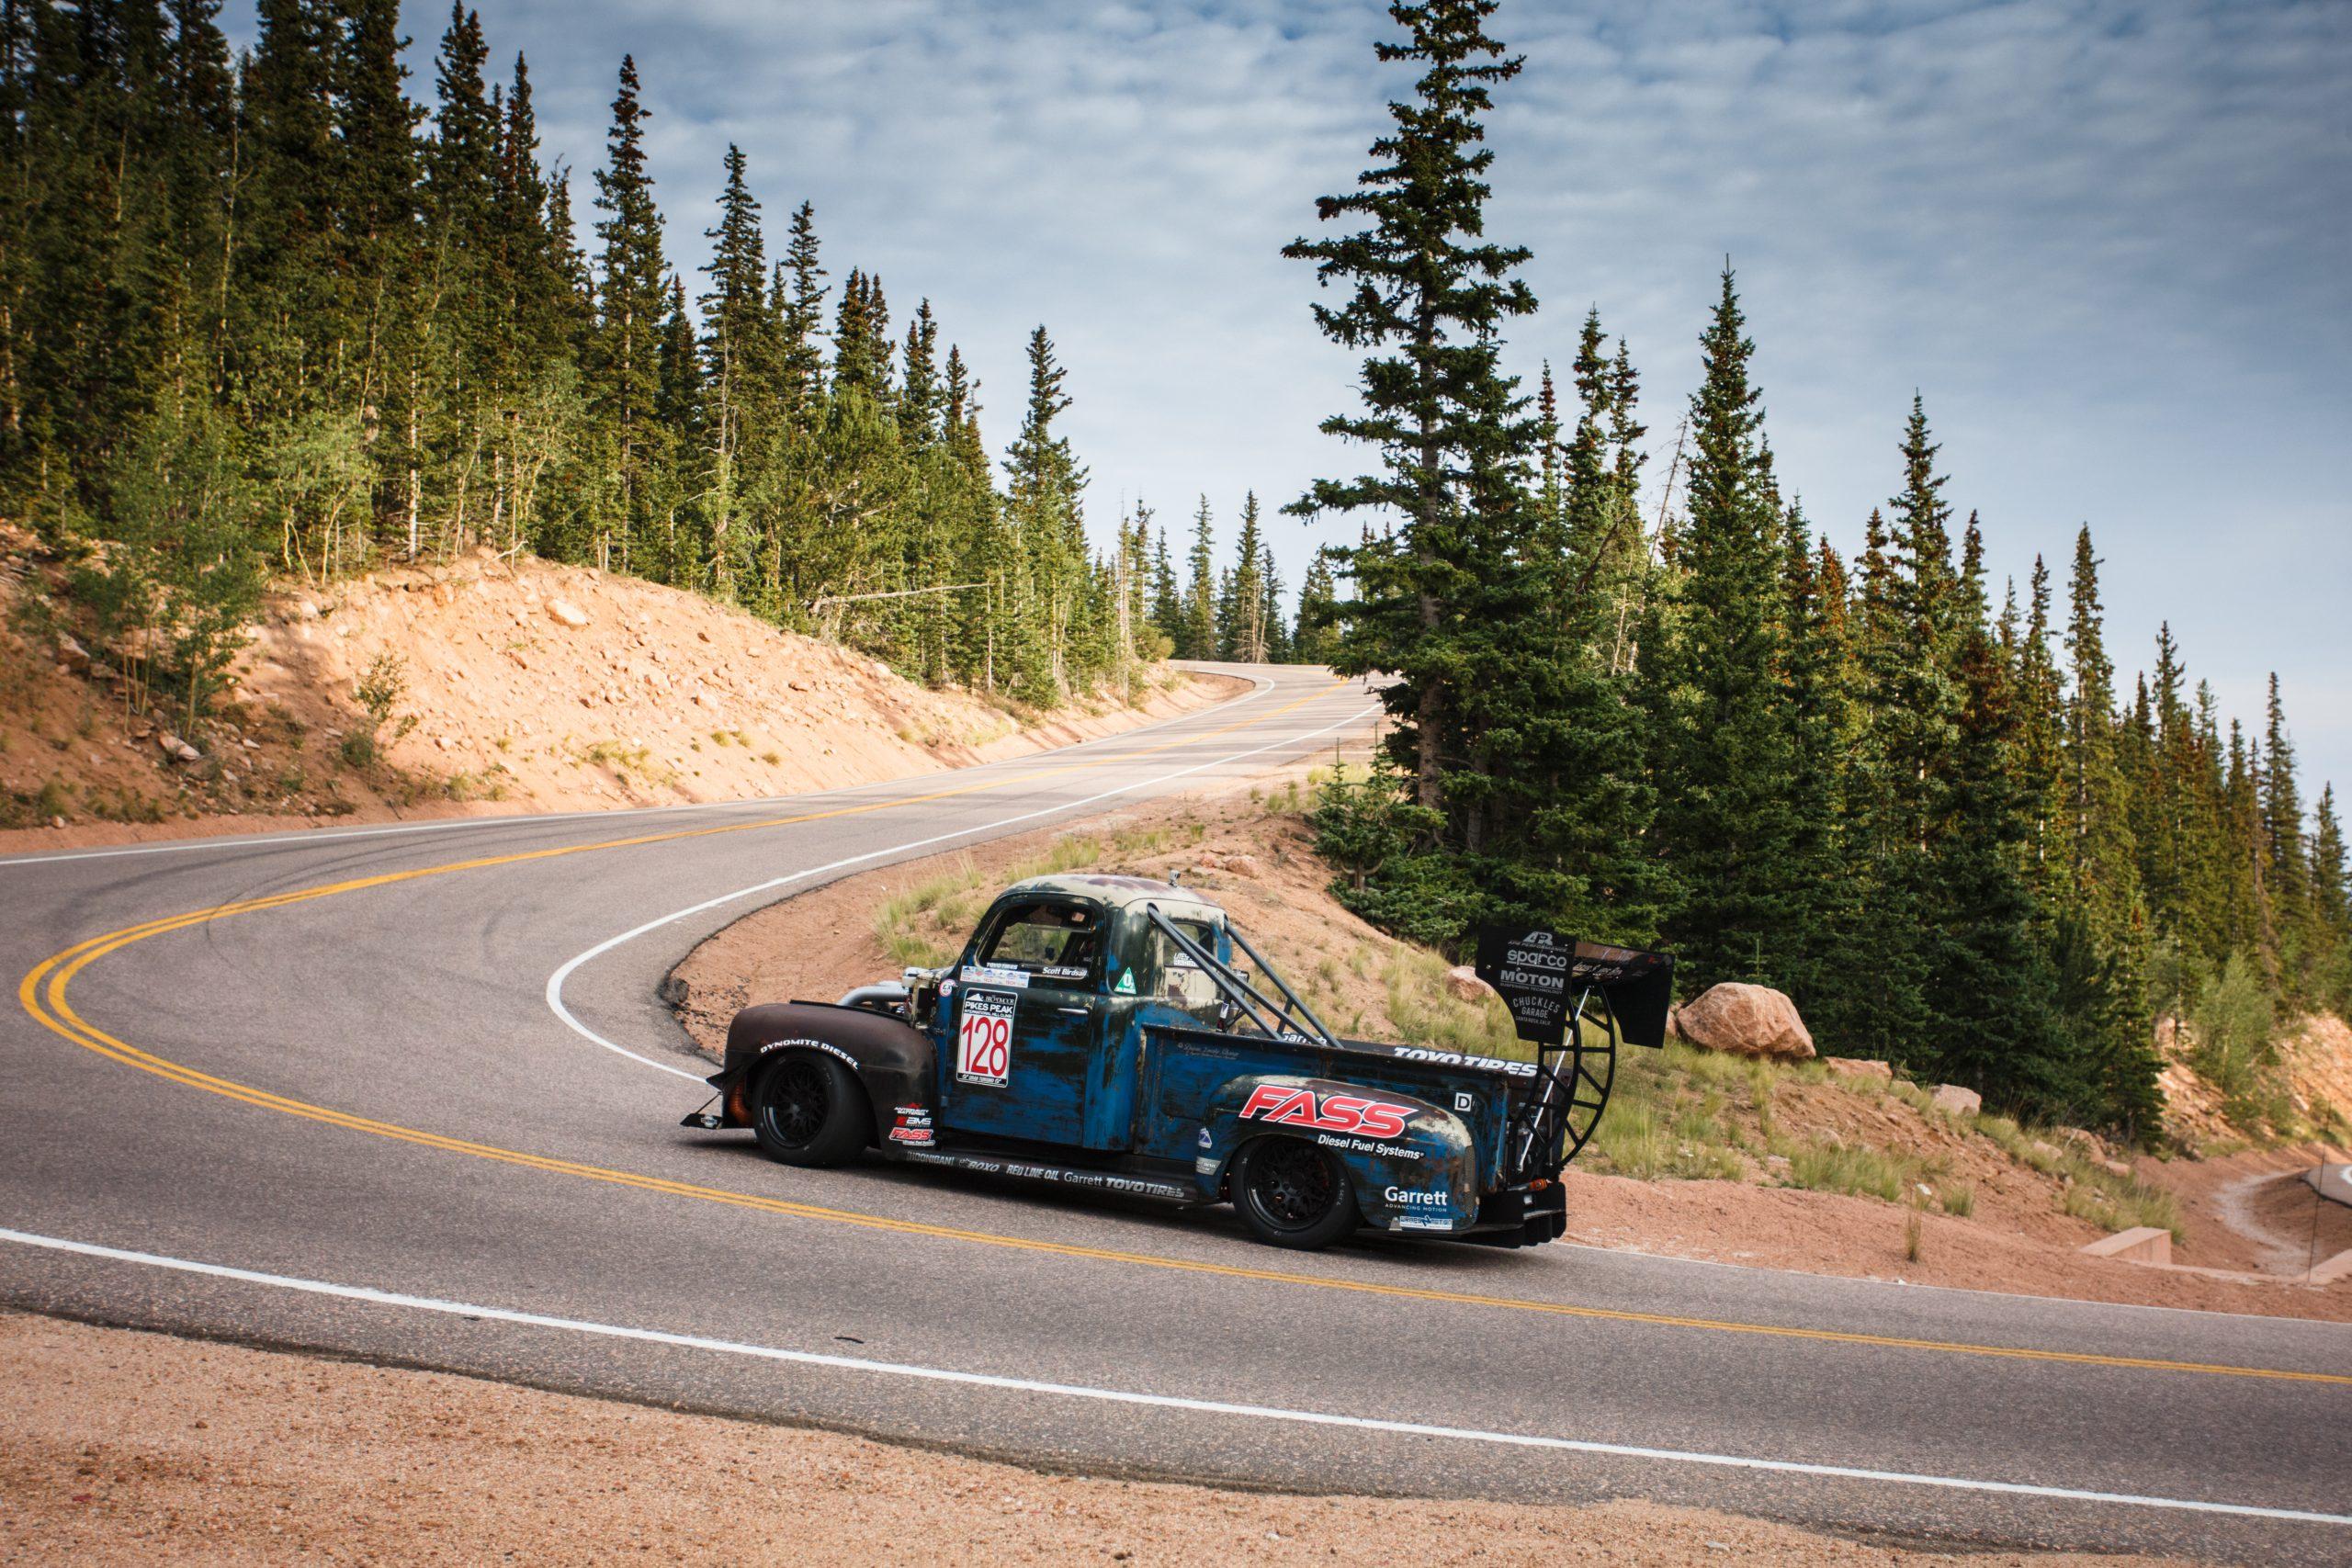 pikes peak international hill climb truck dynamic action